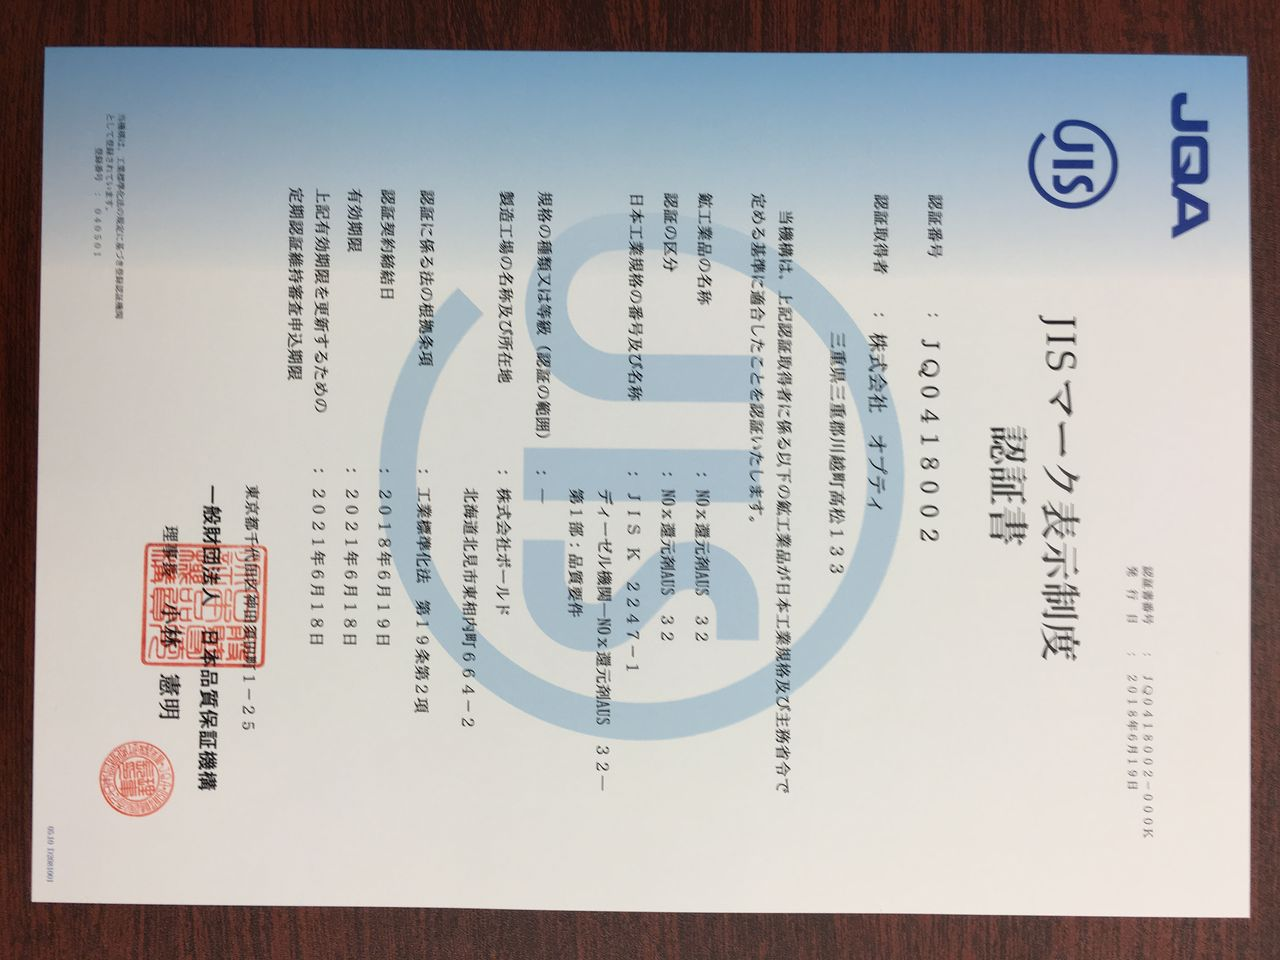 692C4D27-52D4-4484-A1CE-AF96AAF89786